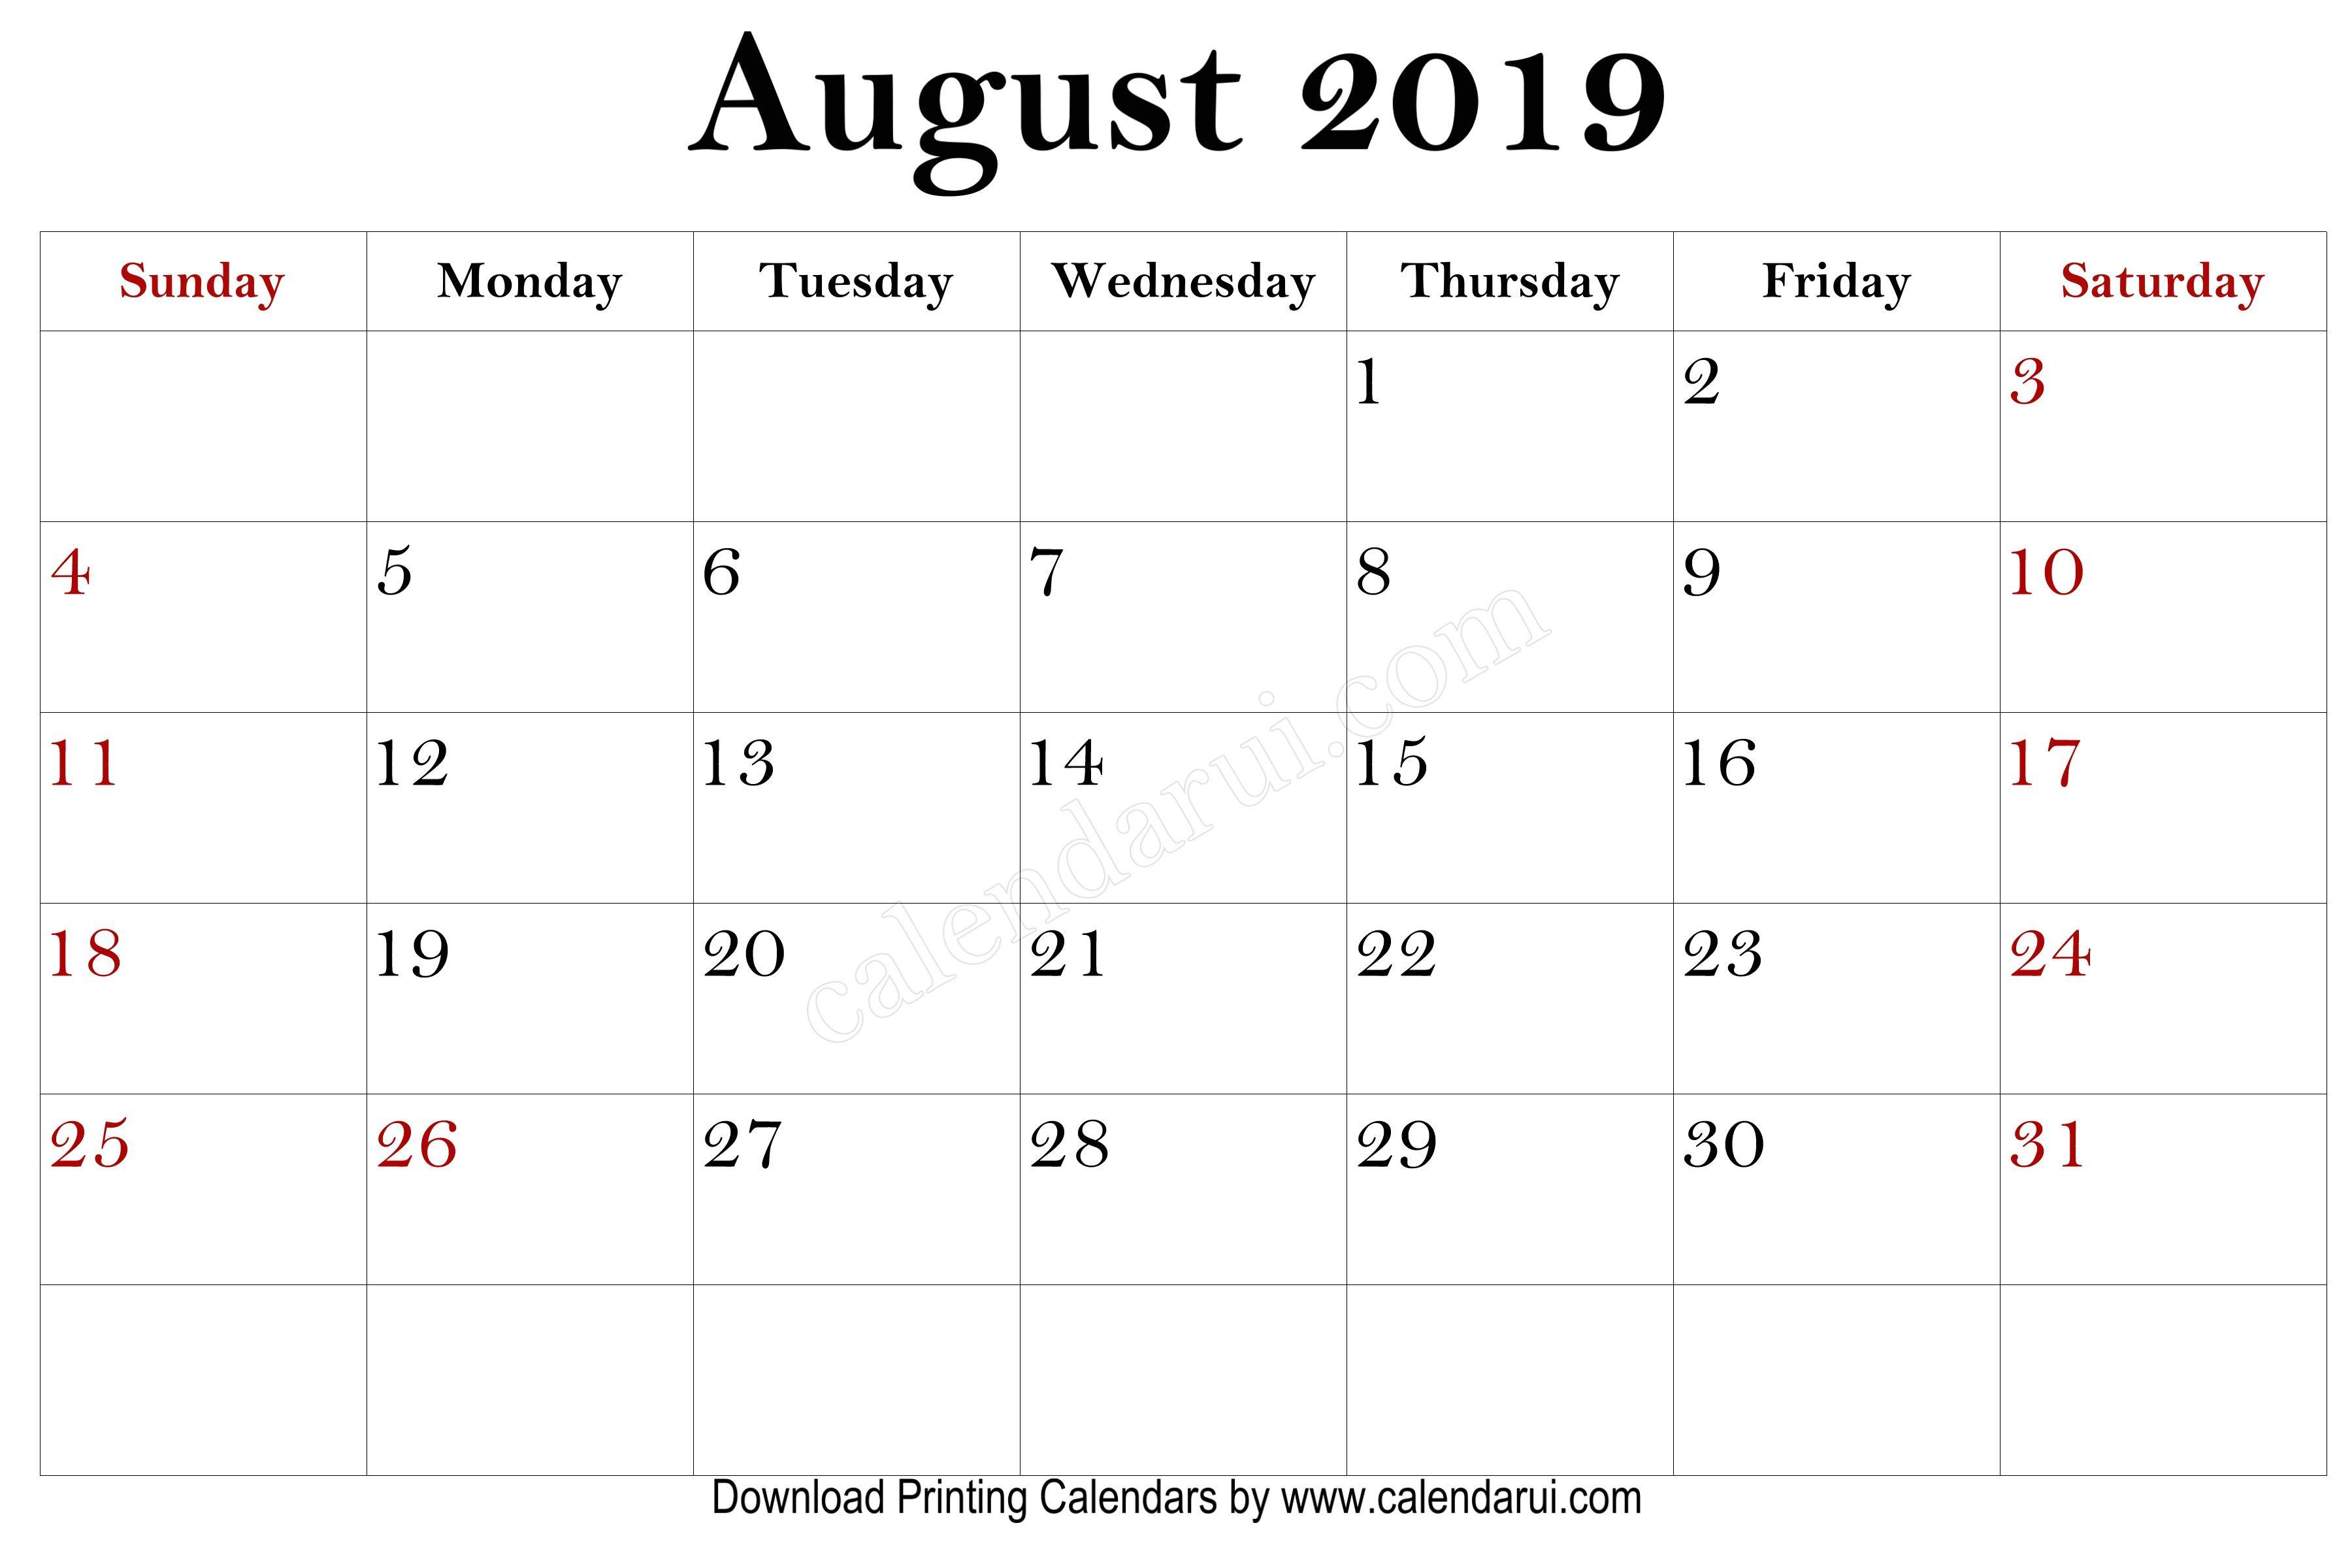 8 August Free Printable Mini 2019 Calendars In 2019